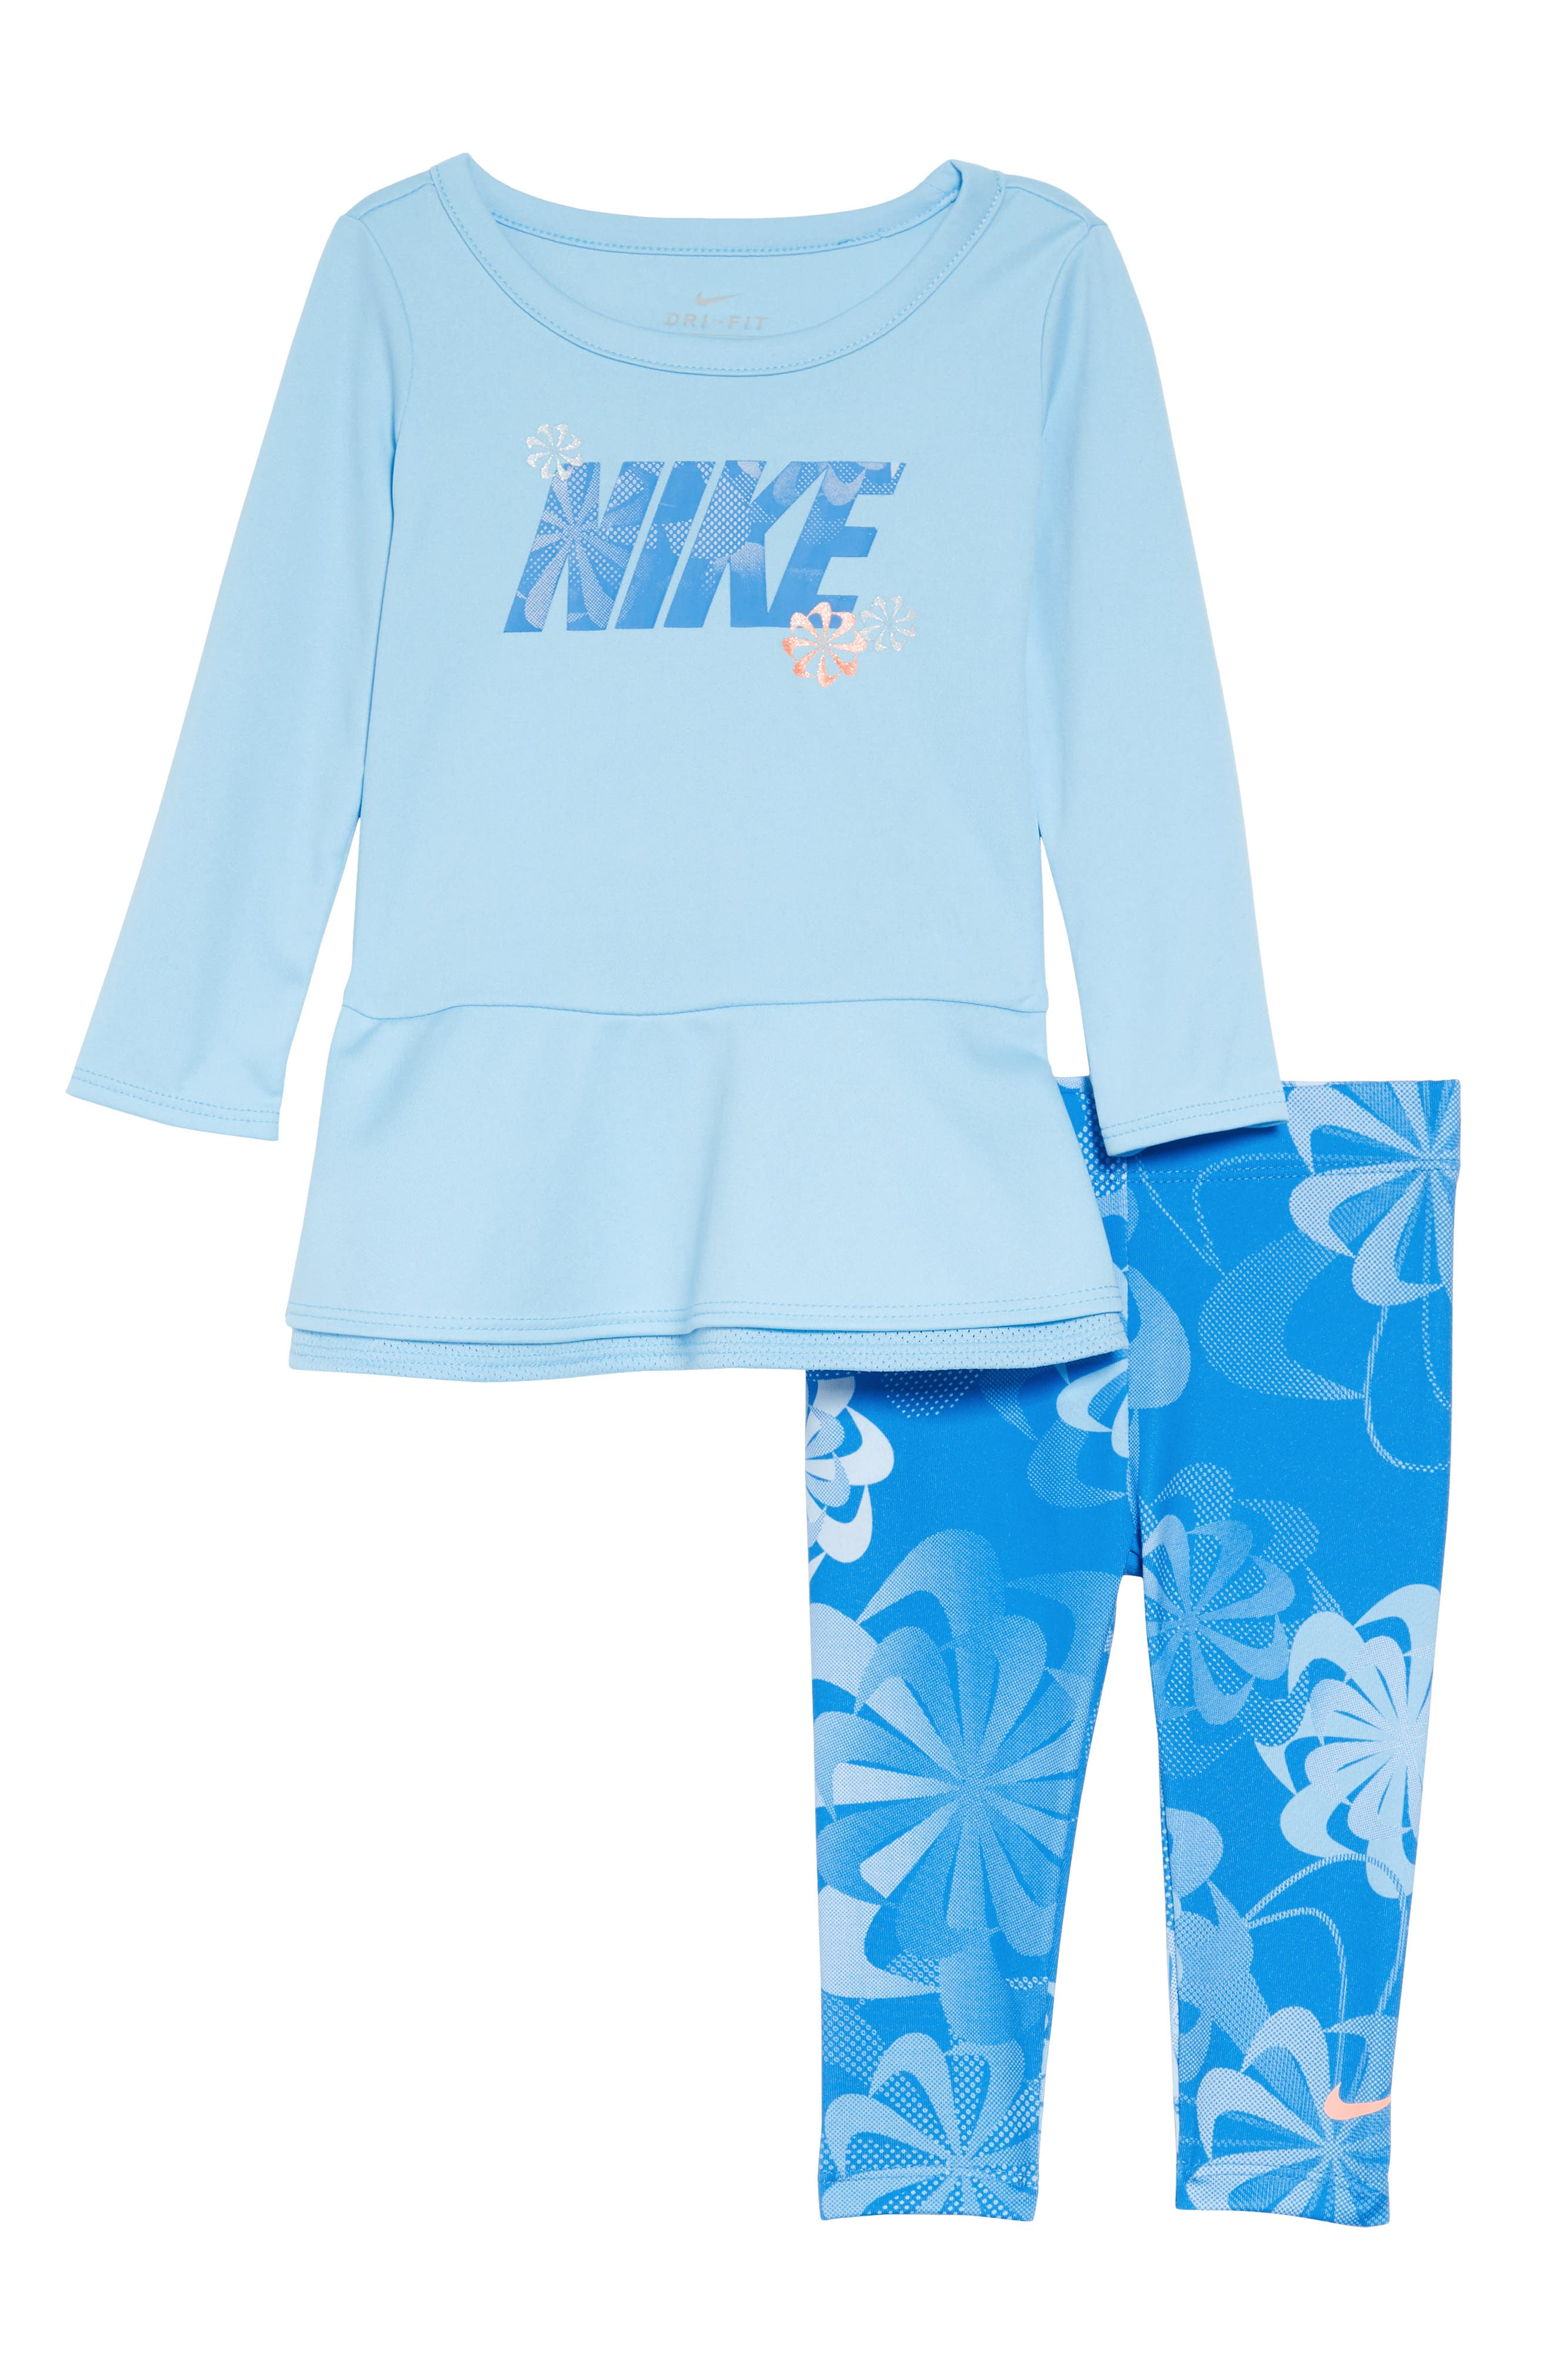 Infant Girls Nike Swoosh Peplum Tunic  Leggings Set